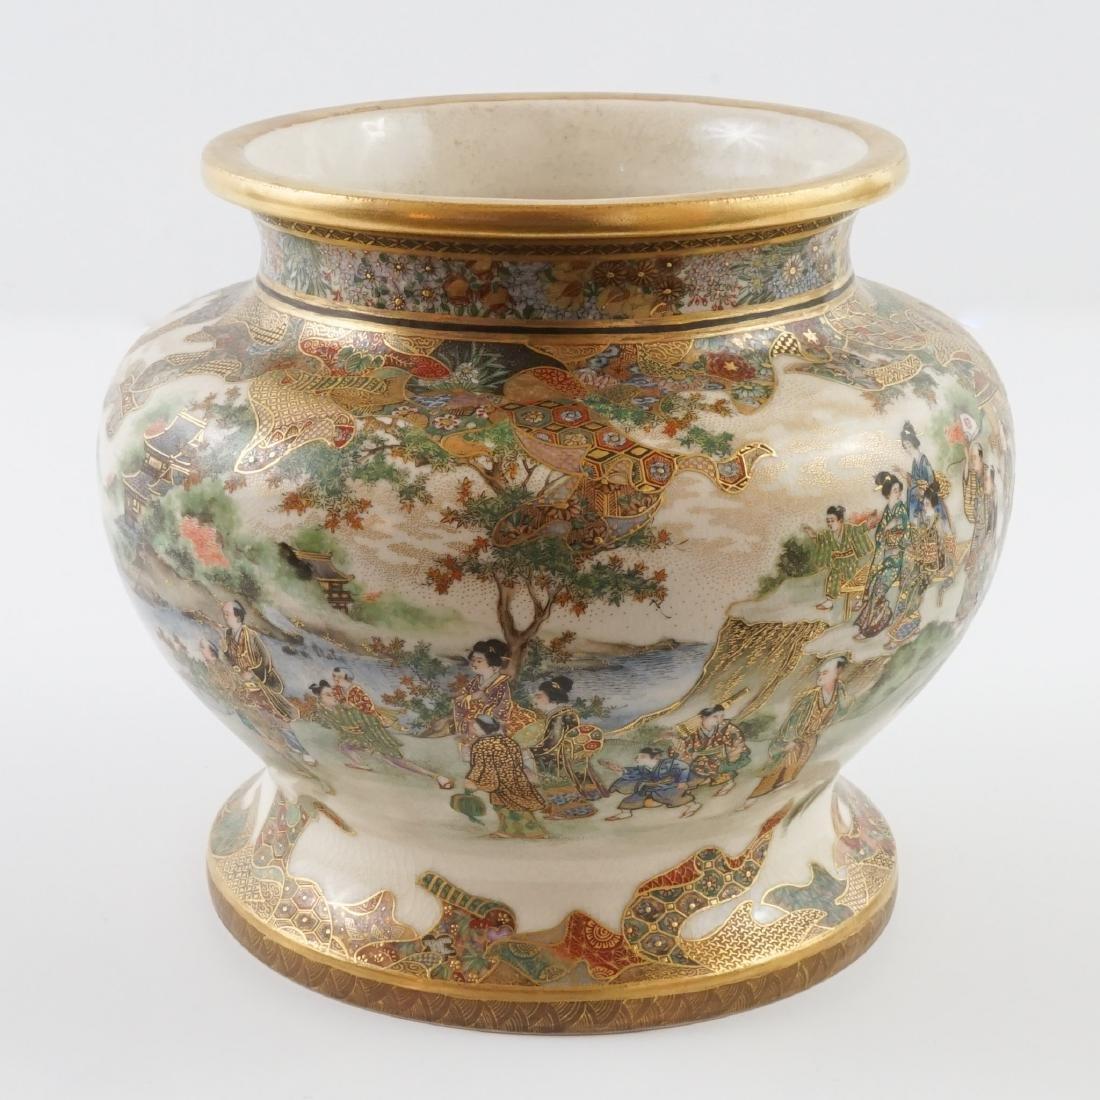 Antique Japanese Ryozan Satauma Jar with Stand - 7